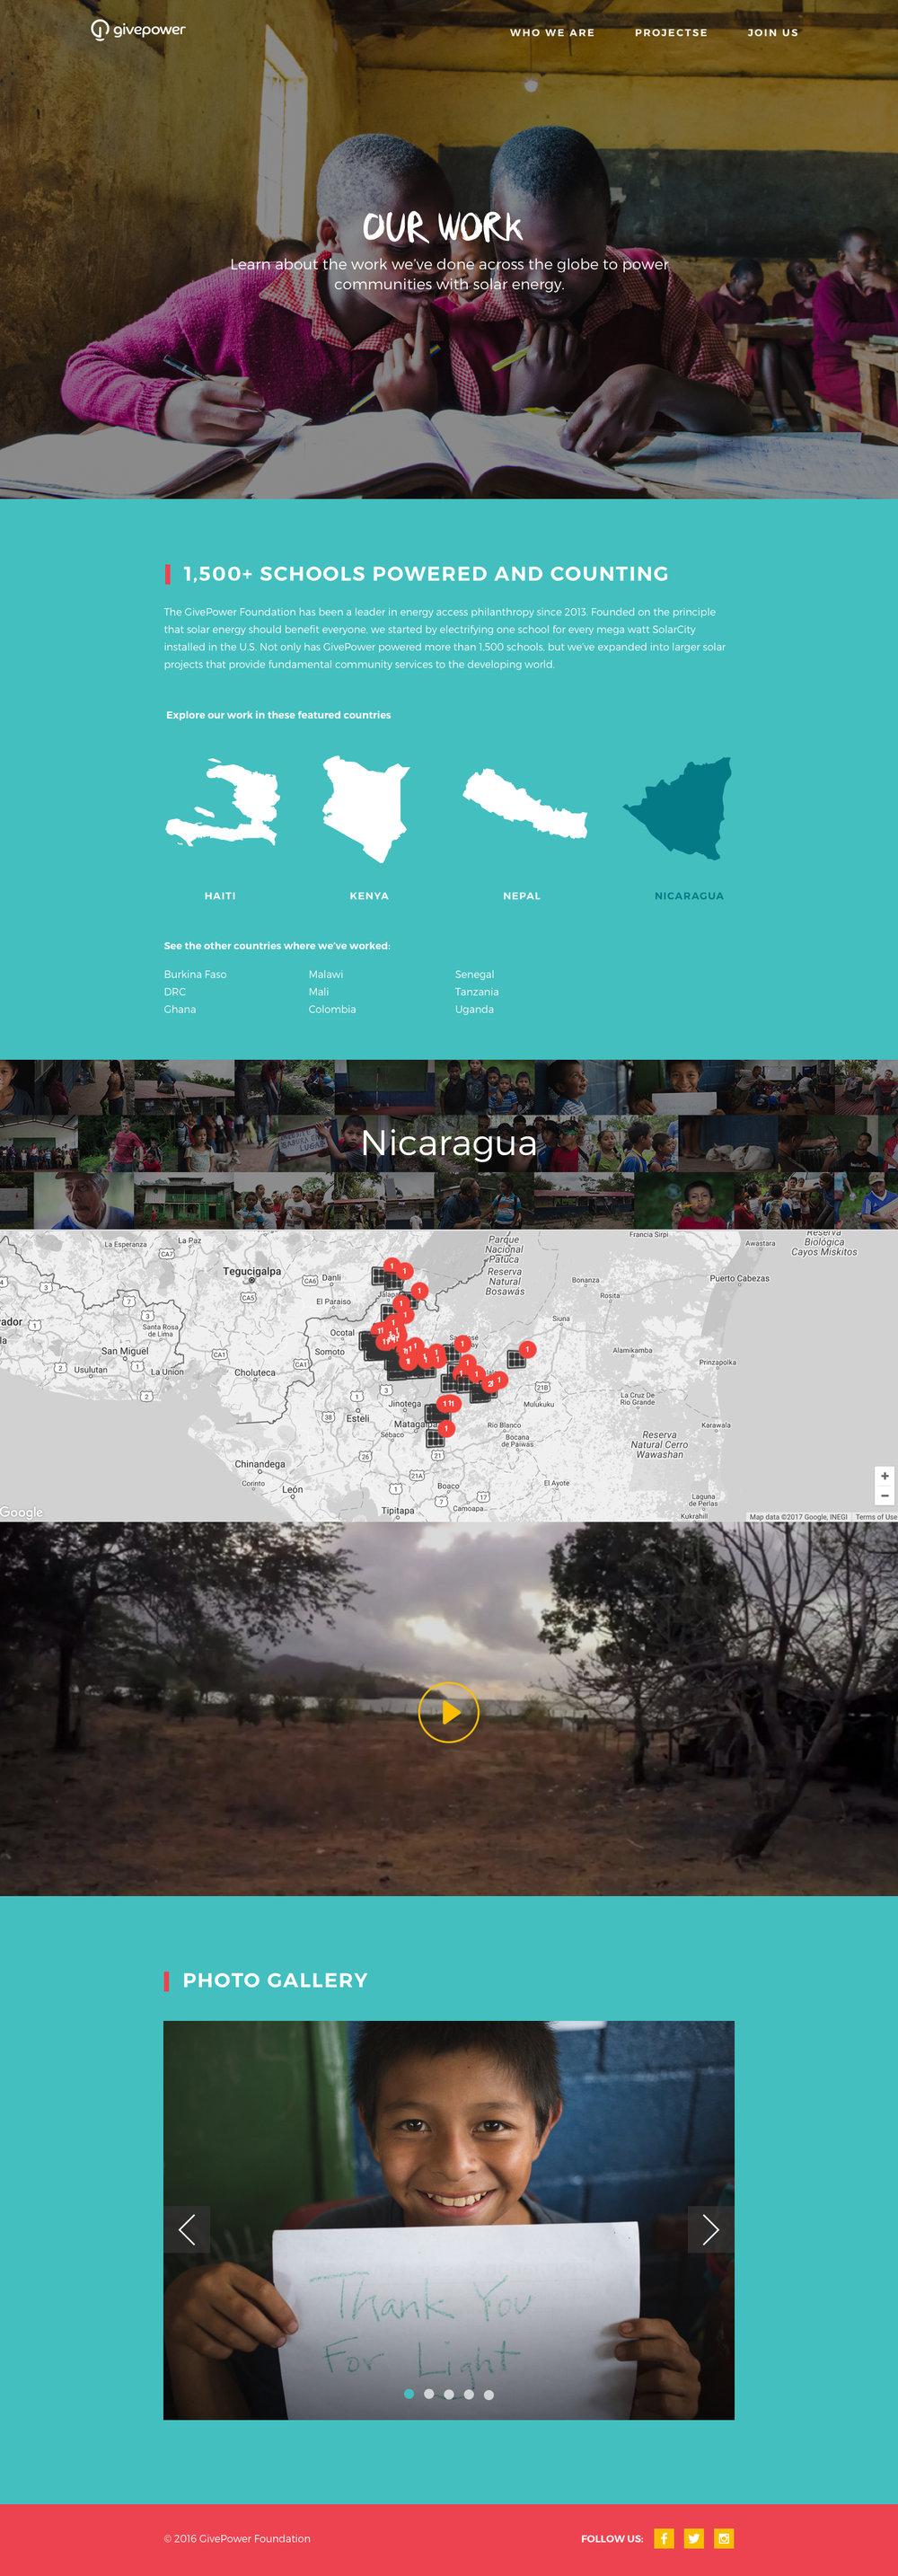 02 our work - nicaragua.jpg